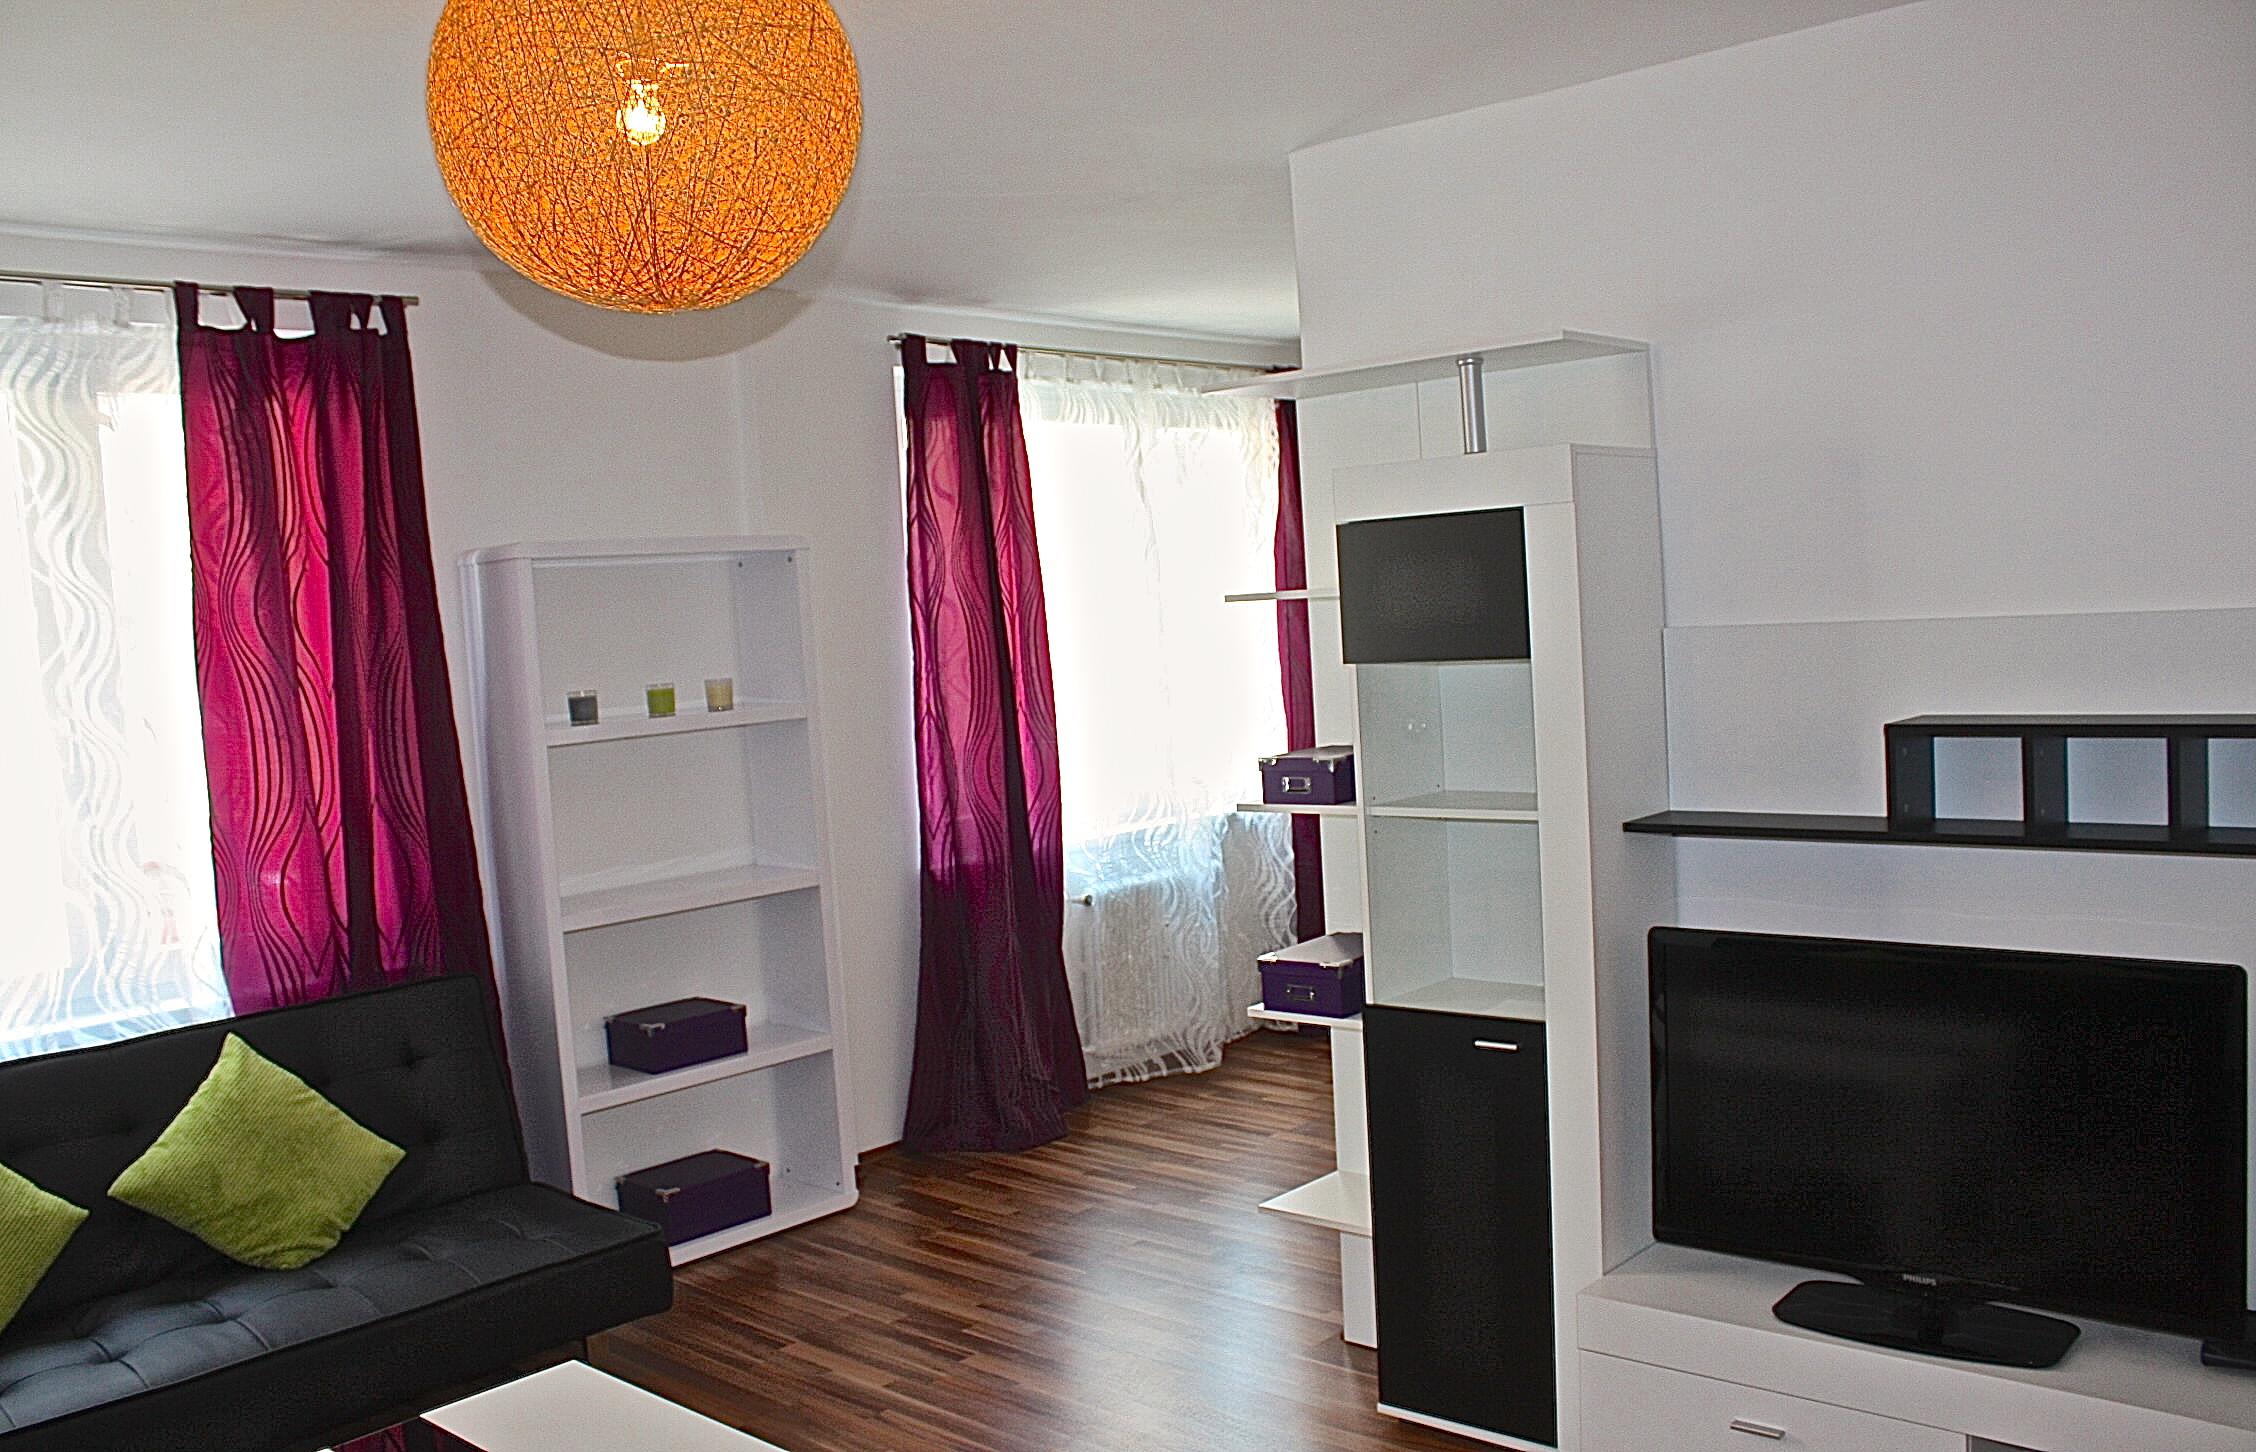 70 m2 Apartment in Vienna, Austria | 15 mins. from city center